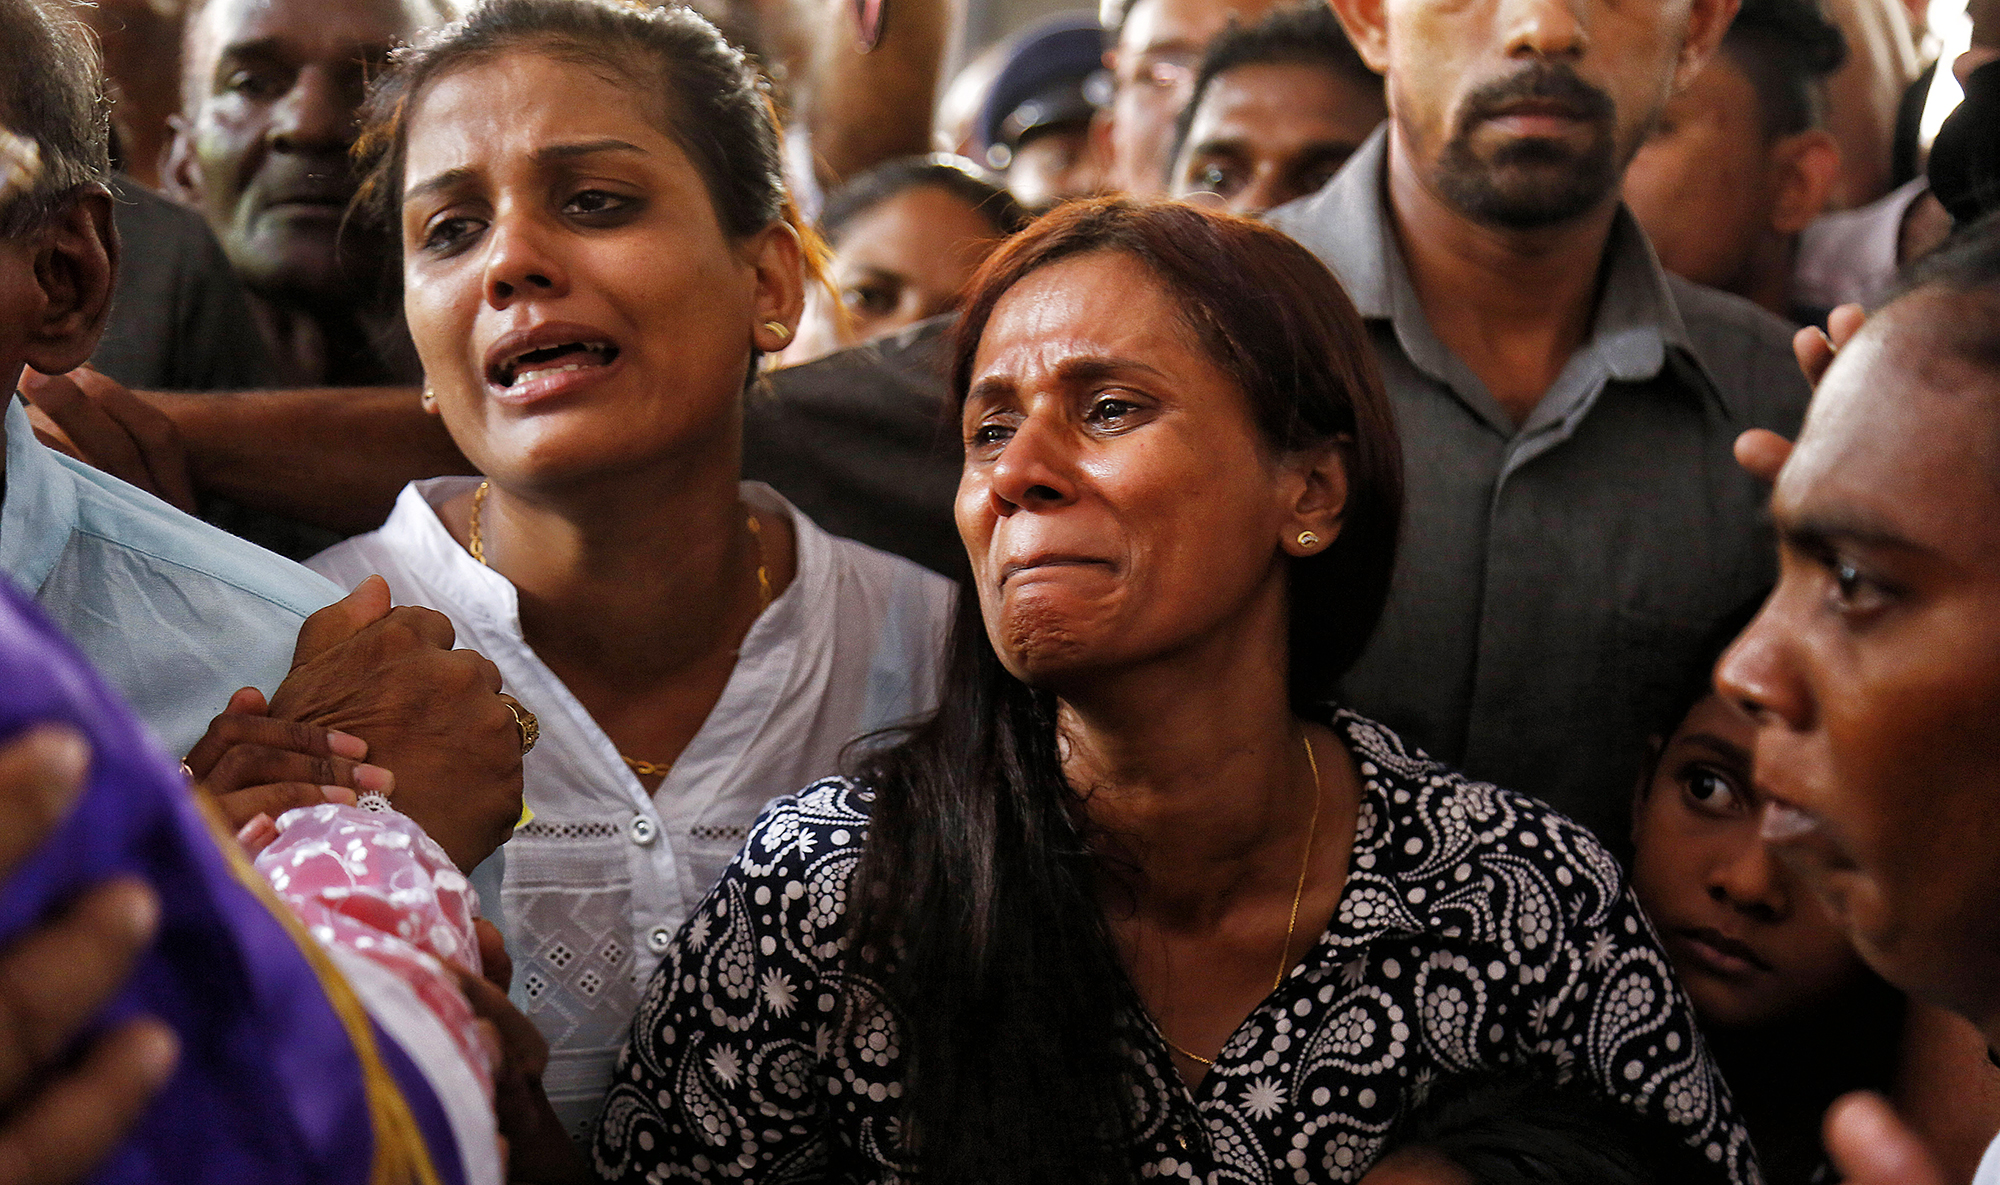 'Adjust or Die' – The Islamic State has adjusted